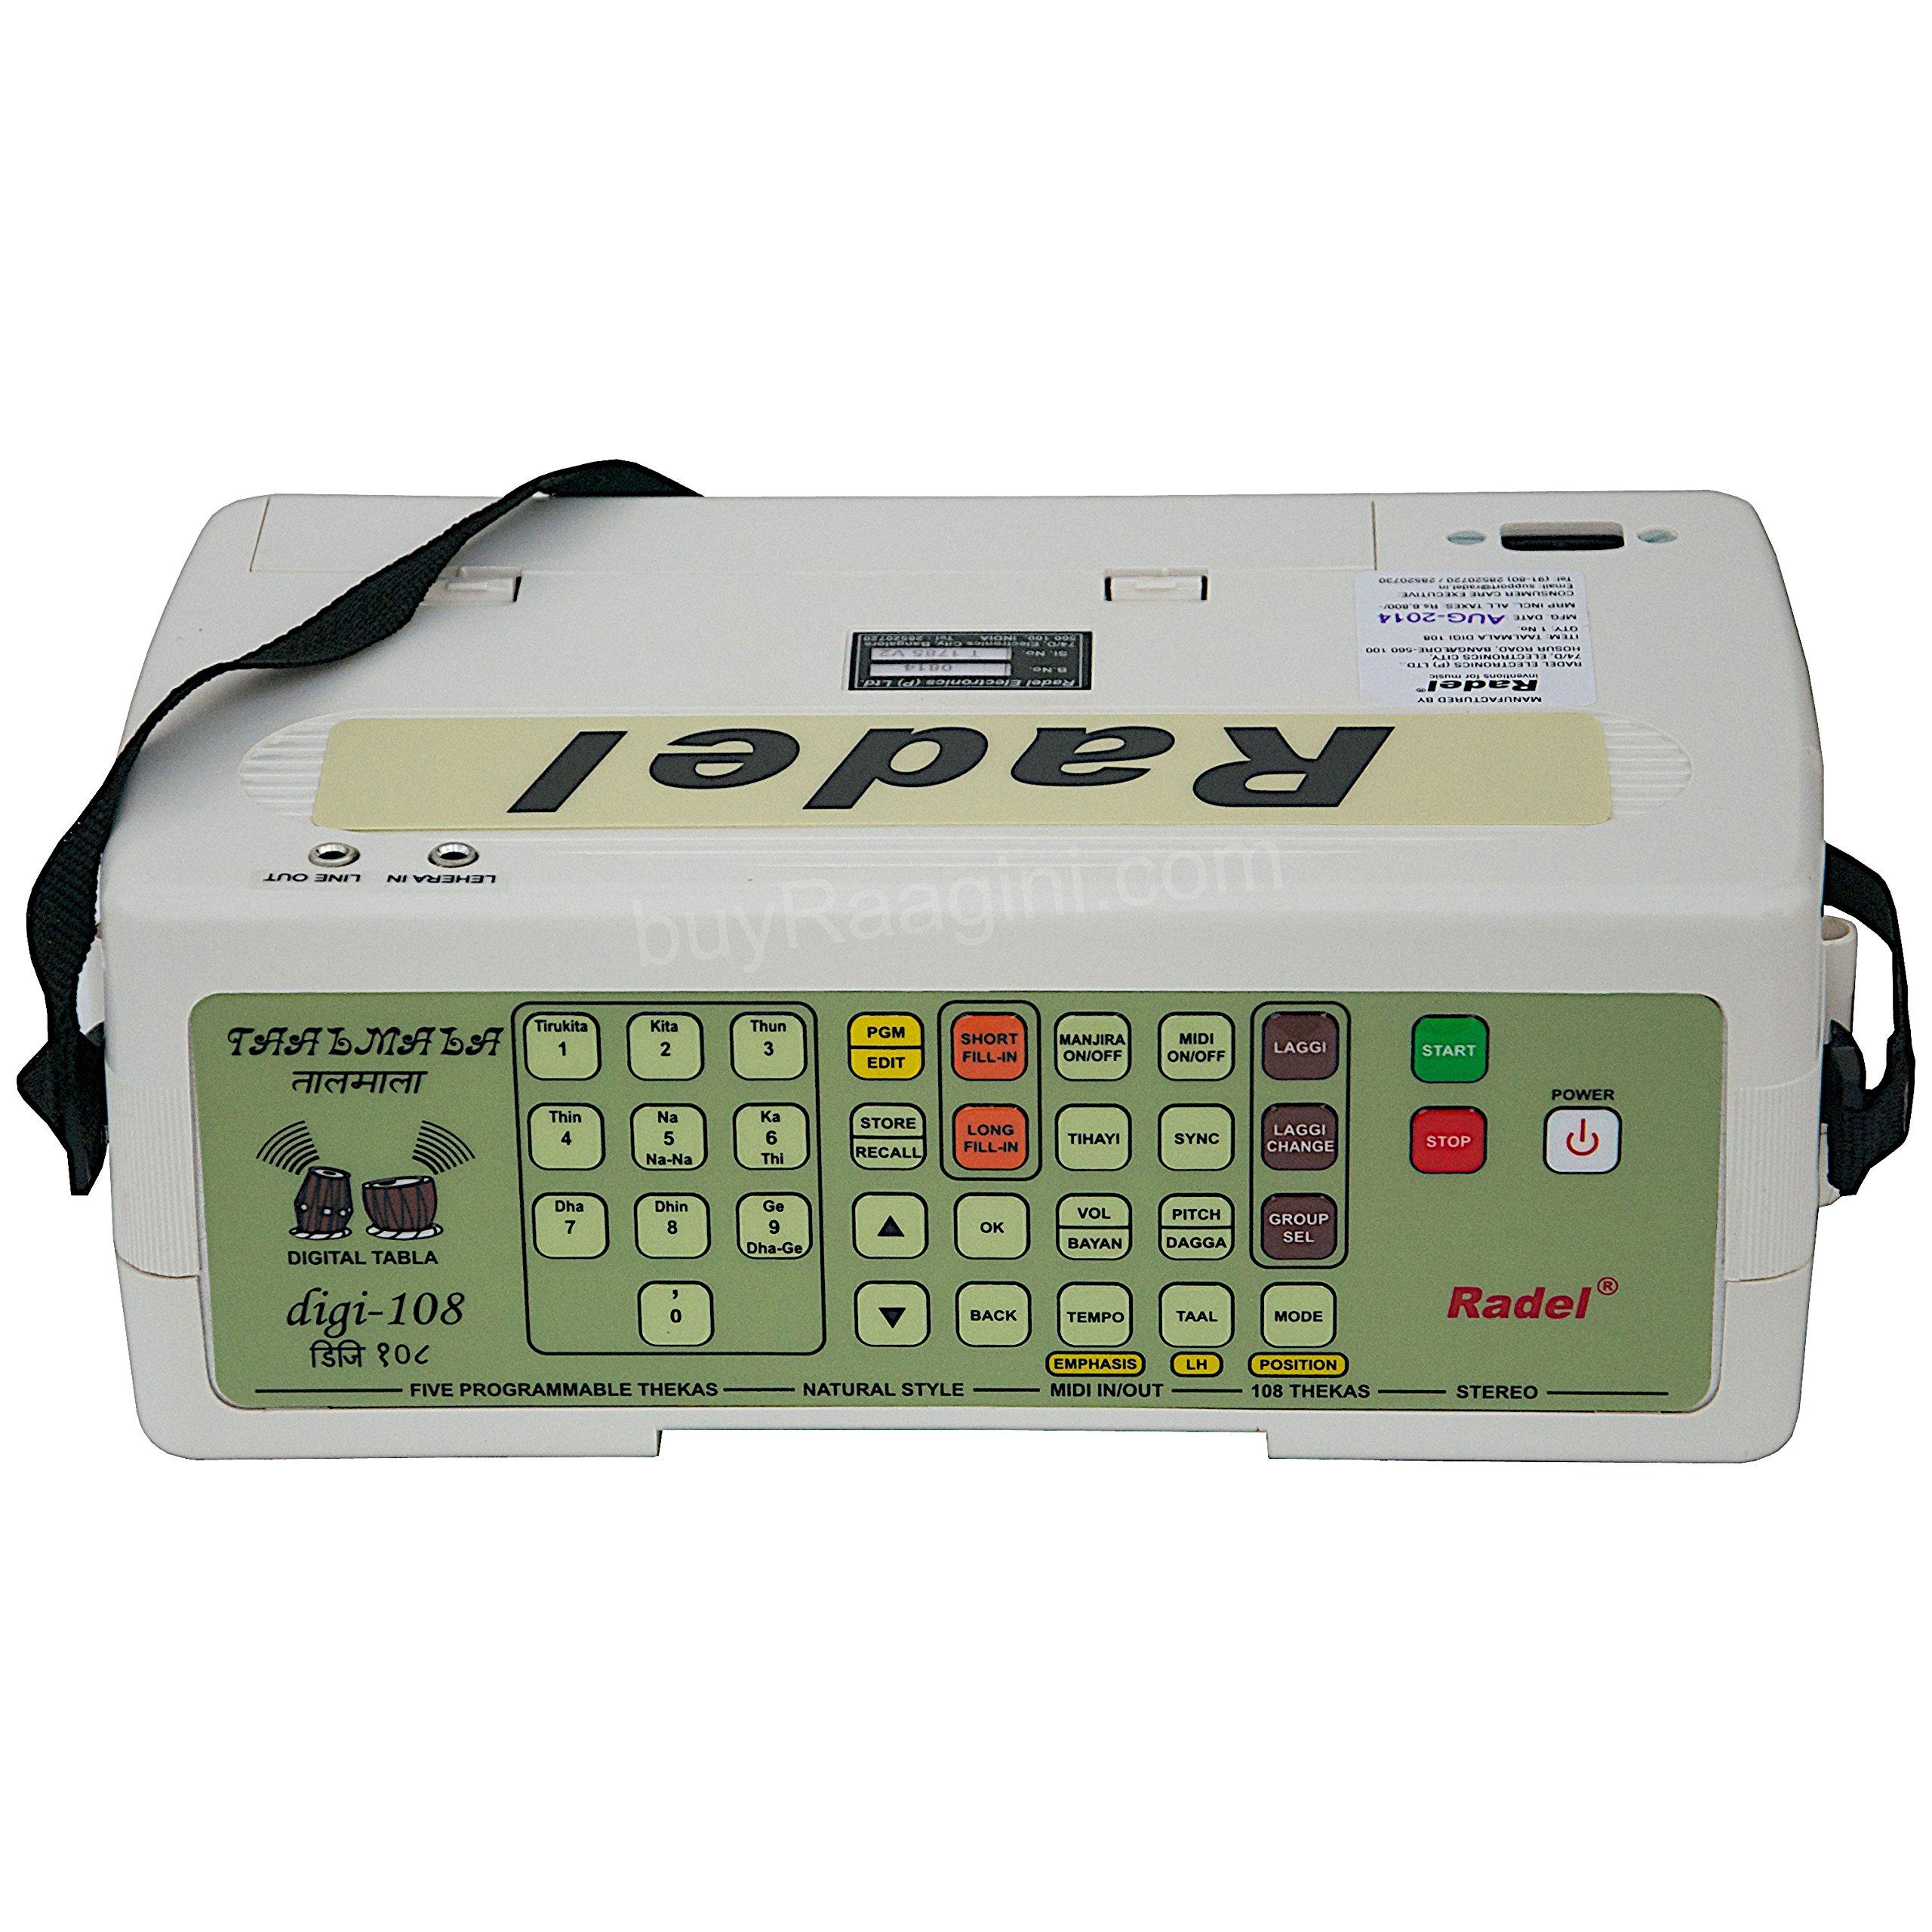 Electronic Tabla - RADEL Taalmala - Digi 108, Electronic Tabla & Manjira - Tabla Sampler, DJ Tabla Sound Machine, Instruction Manual, Power Cord, Bag (US-PDI-AAF) by Radel at buyRaagini.com (Image #6)